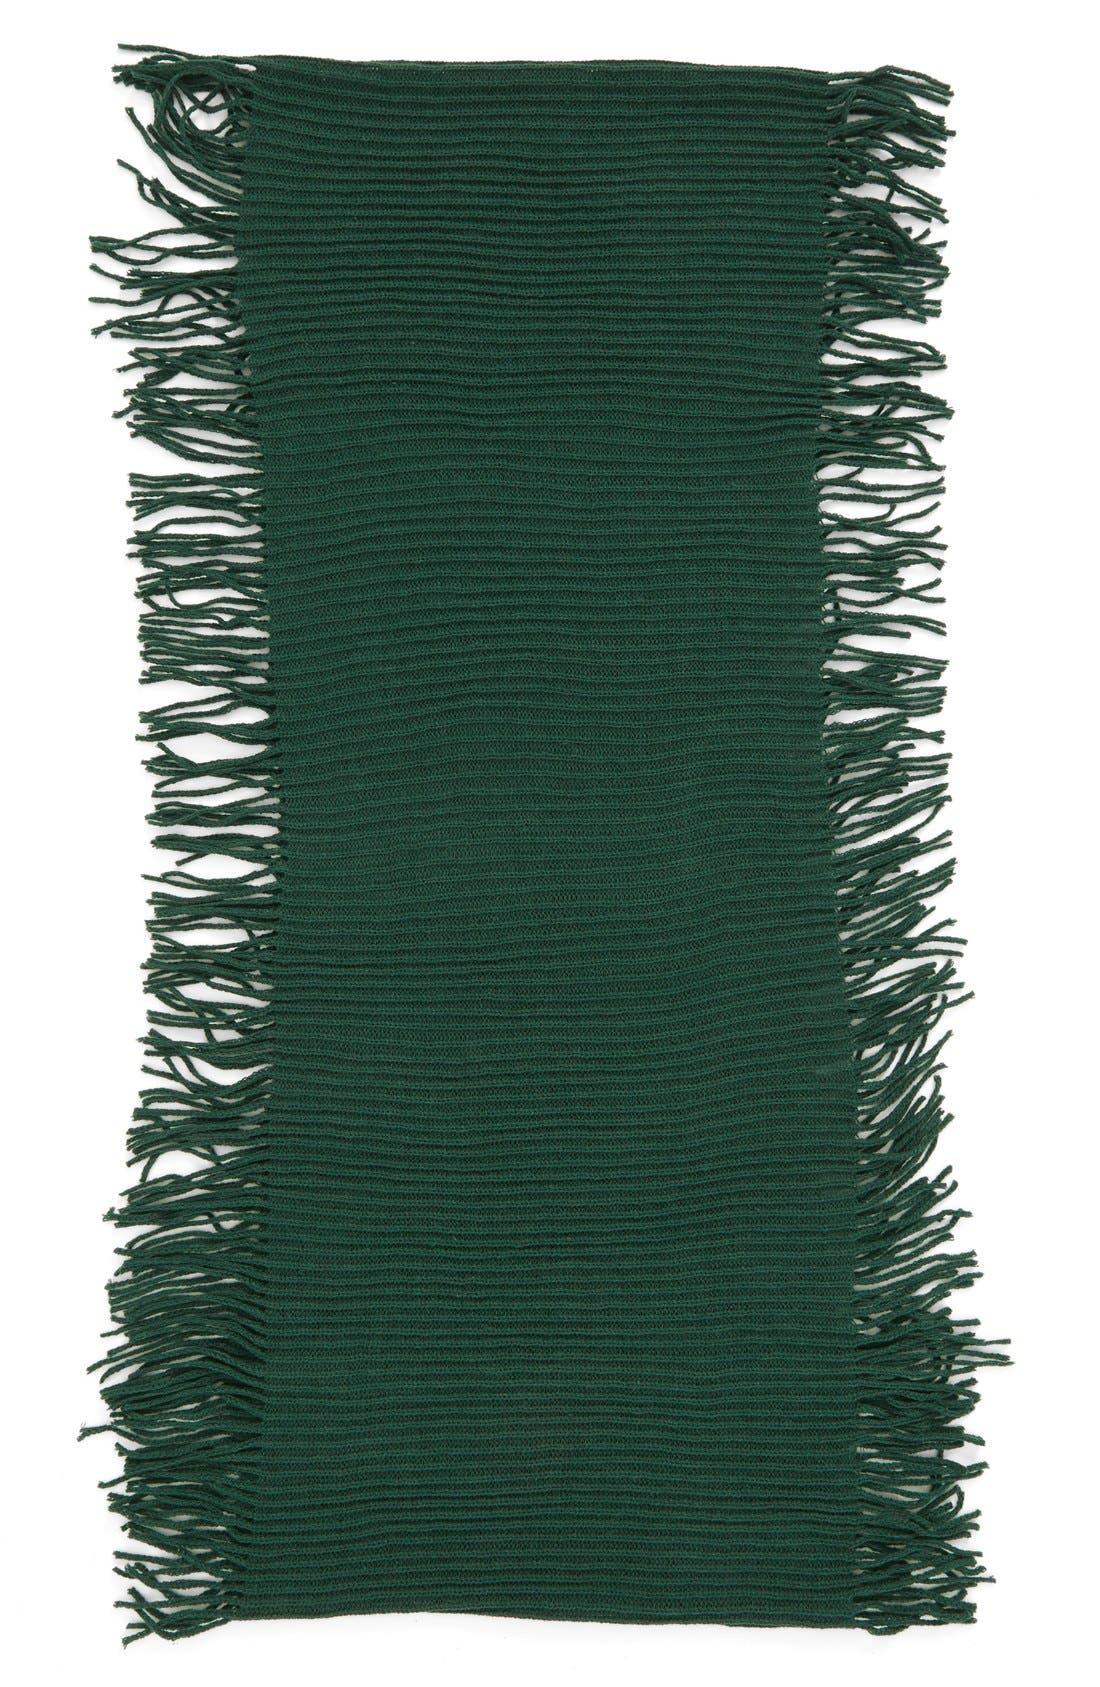 Rib Knit Fringe Infinity Scarf,                             Alternate thumbnail 16, color,